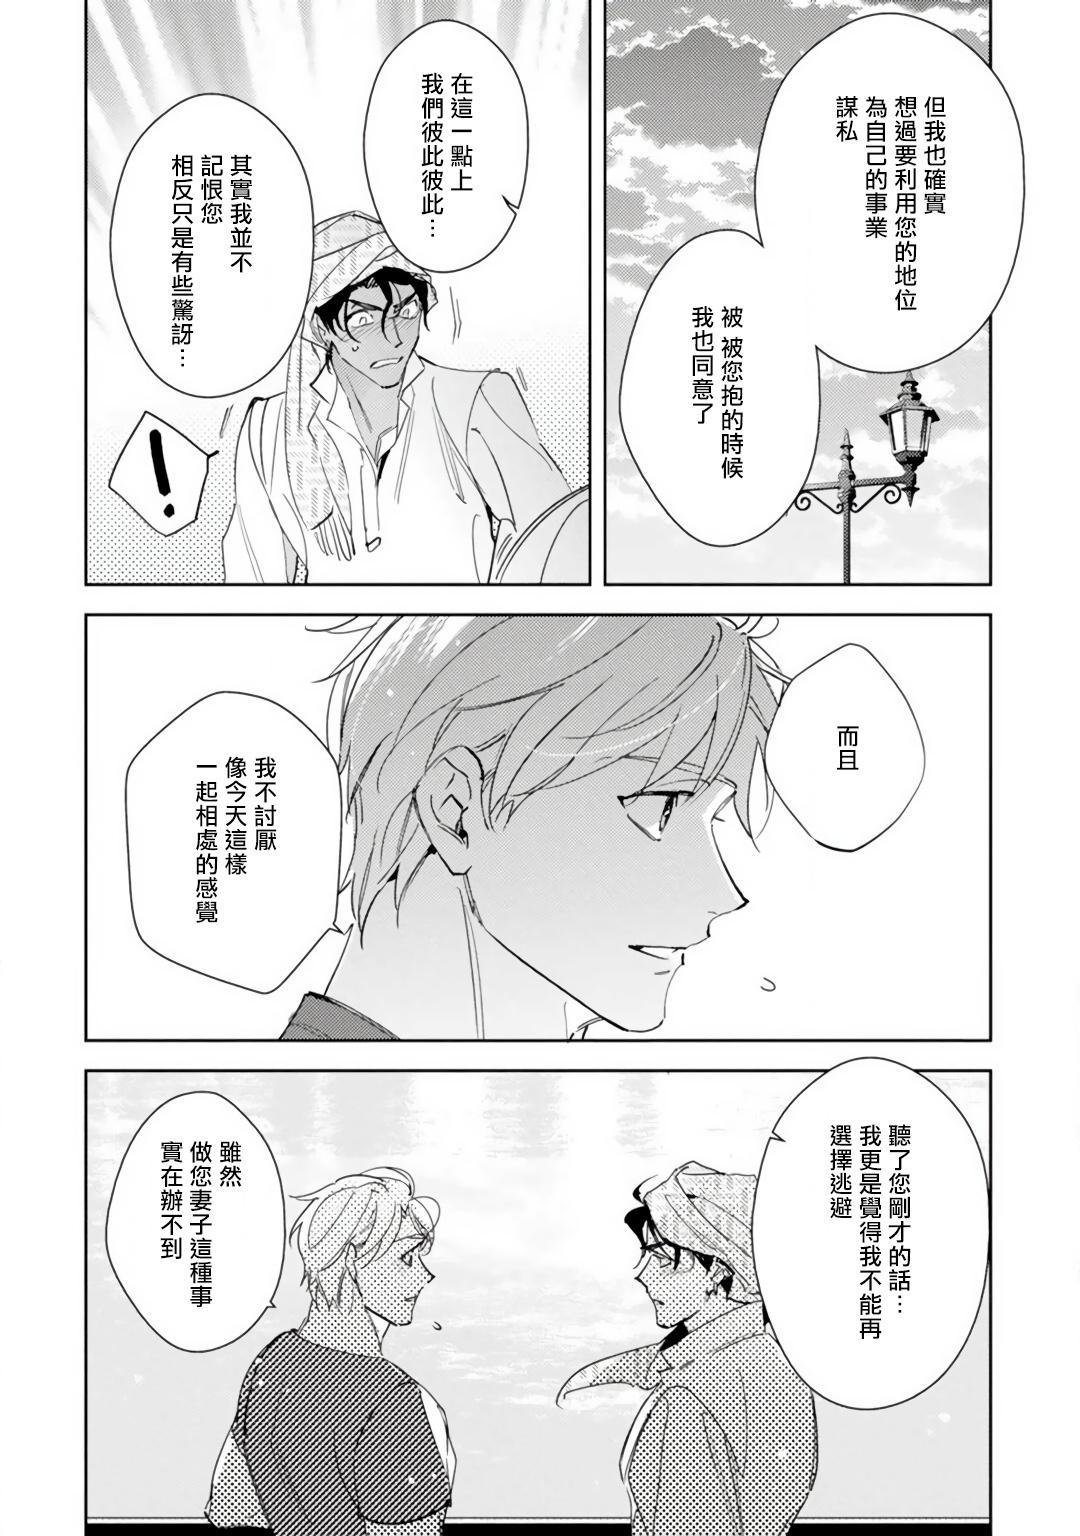 Amber Vanilla no Hanayome | 琥珀香草的新娘 Ch. 1-3 70